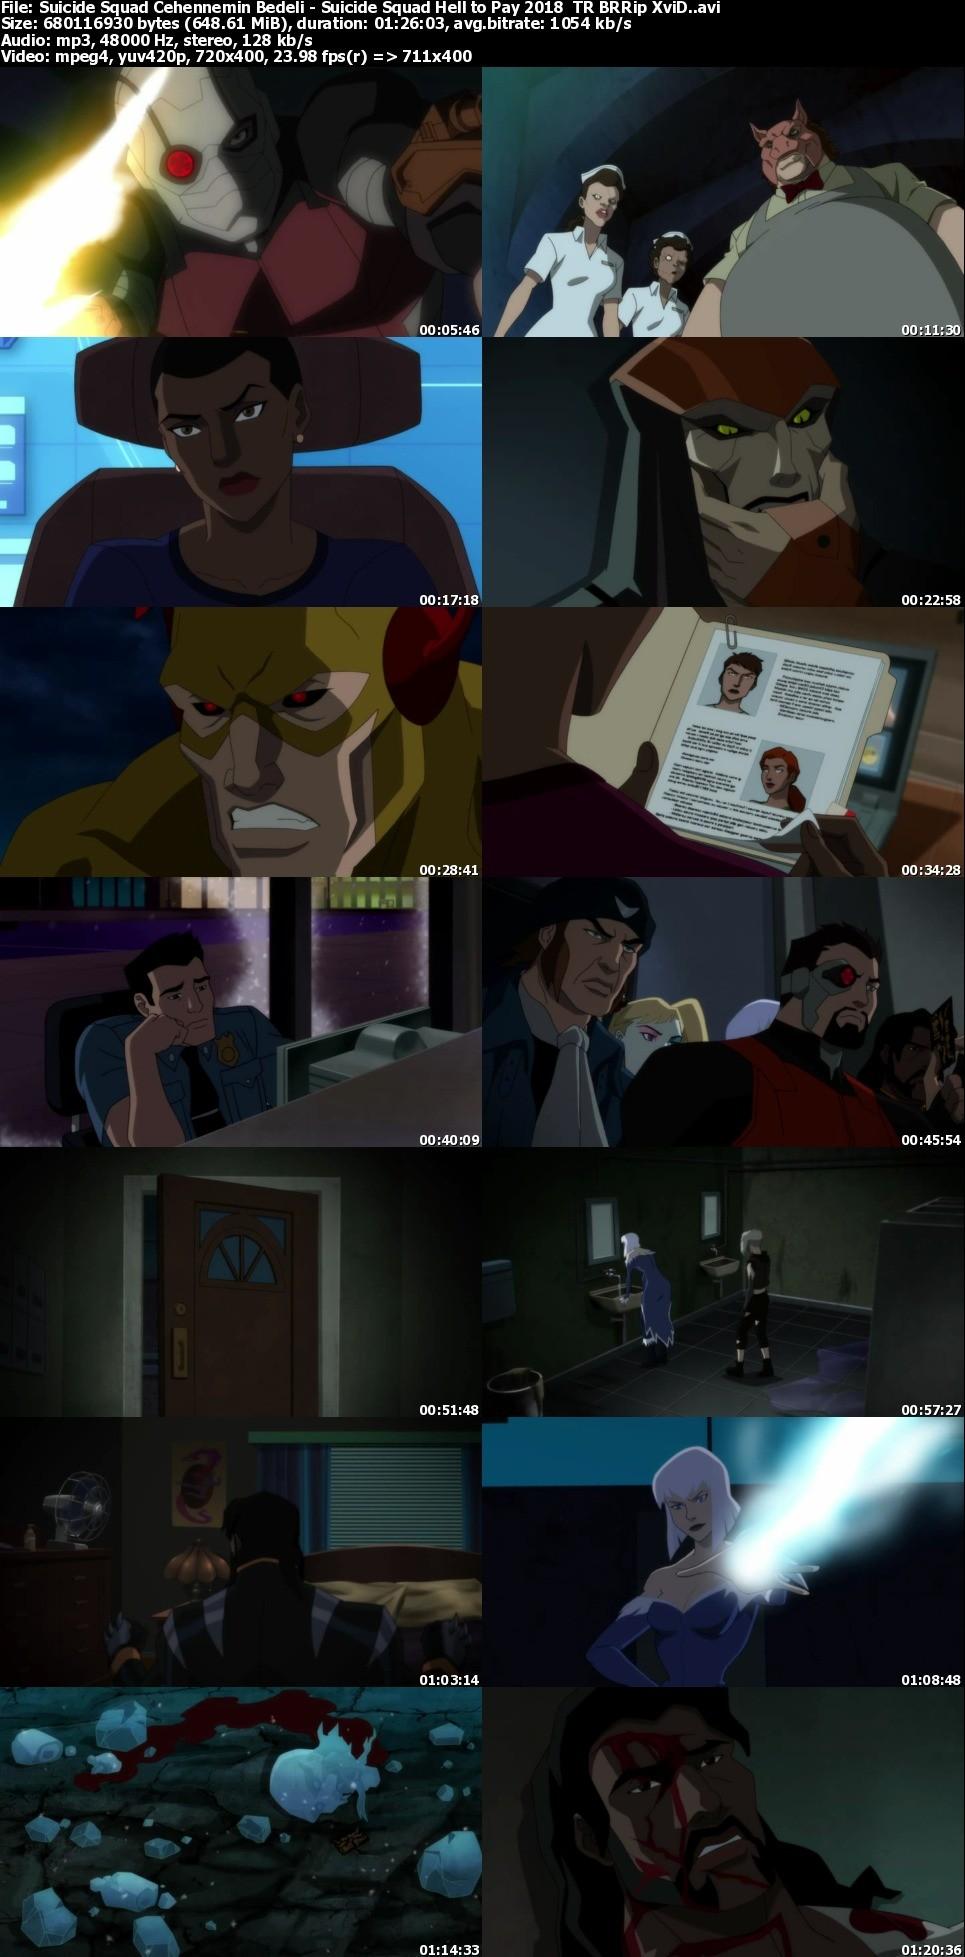 Suicide Squad: Cehennemin Bedeli - 2018 - BRRip - 1080p - Türkçe Dublaj